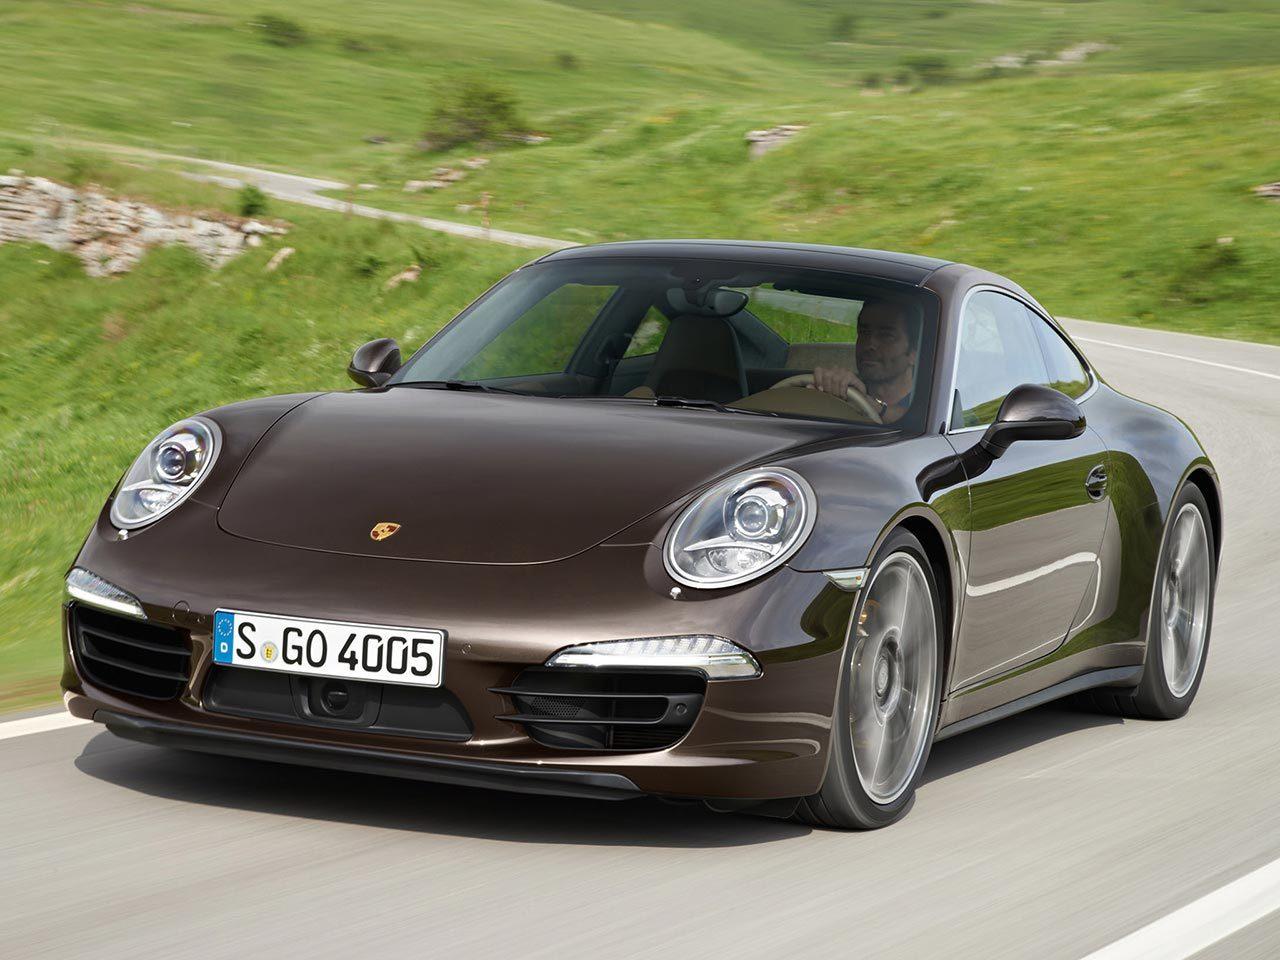 Foto de Porsche 911 Carrera 4 y Carrera 4S (1/5)